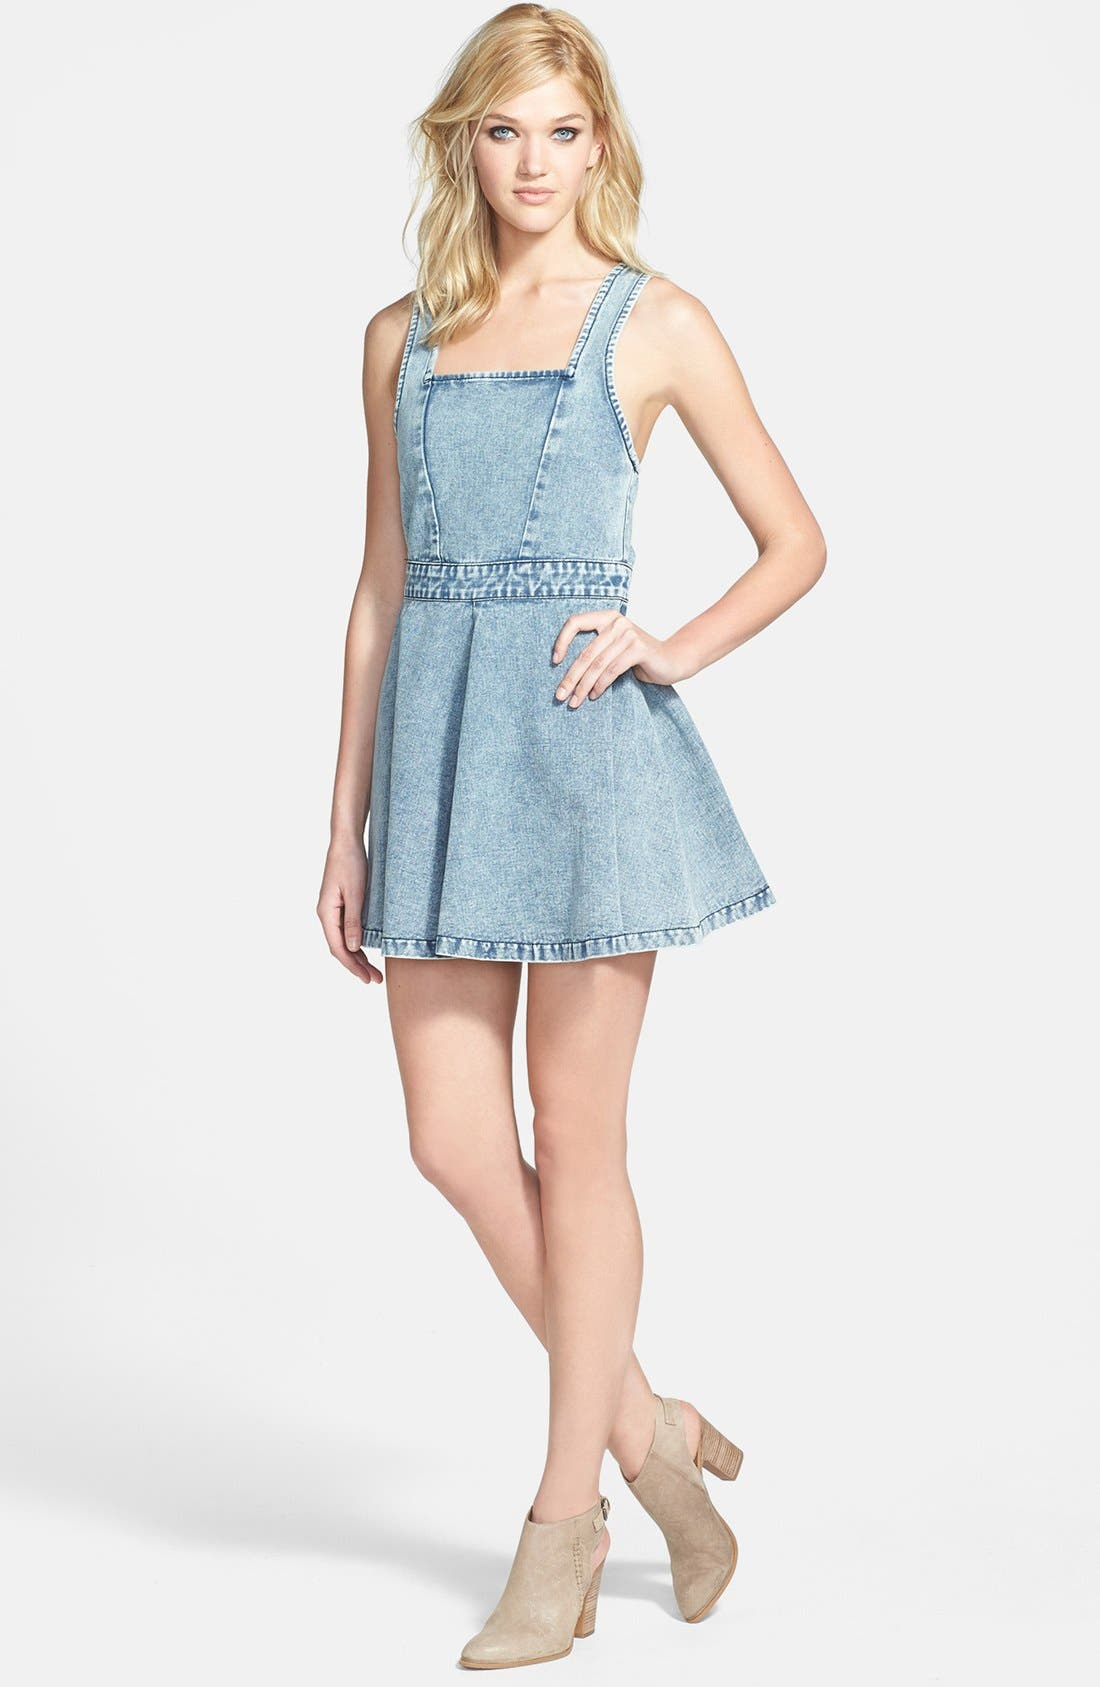 Alternate Image 1 Selected - MINKPINK 'Funday Sunday' Denim Pinafore Dress